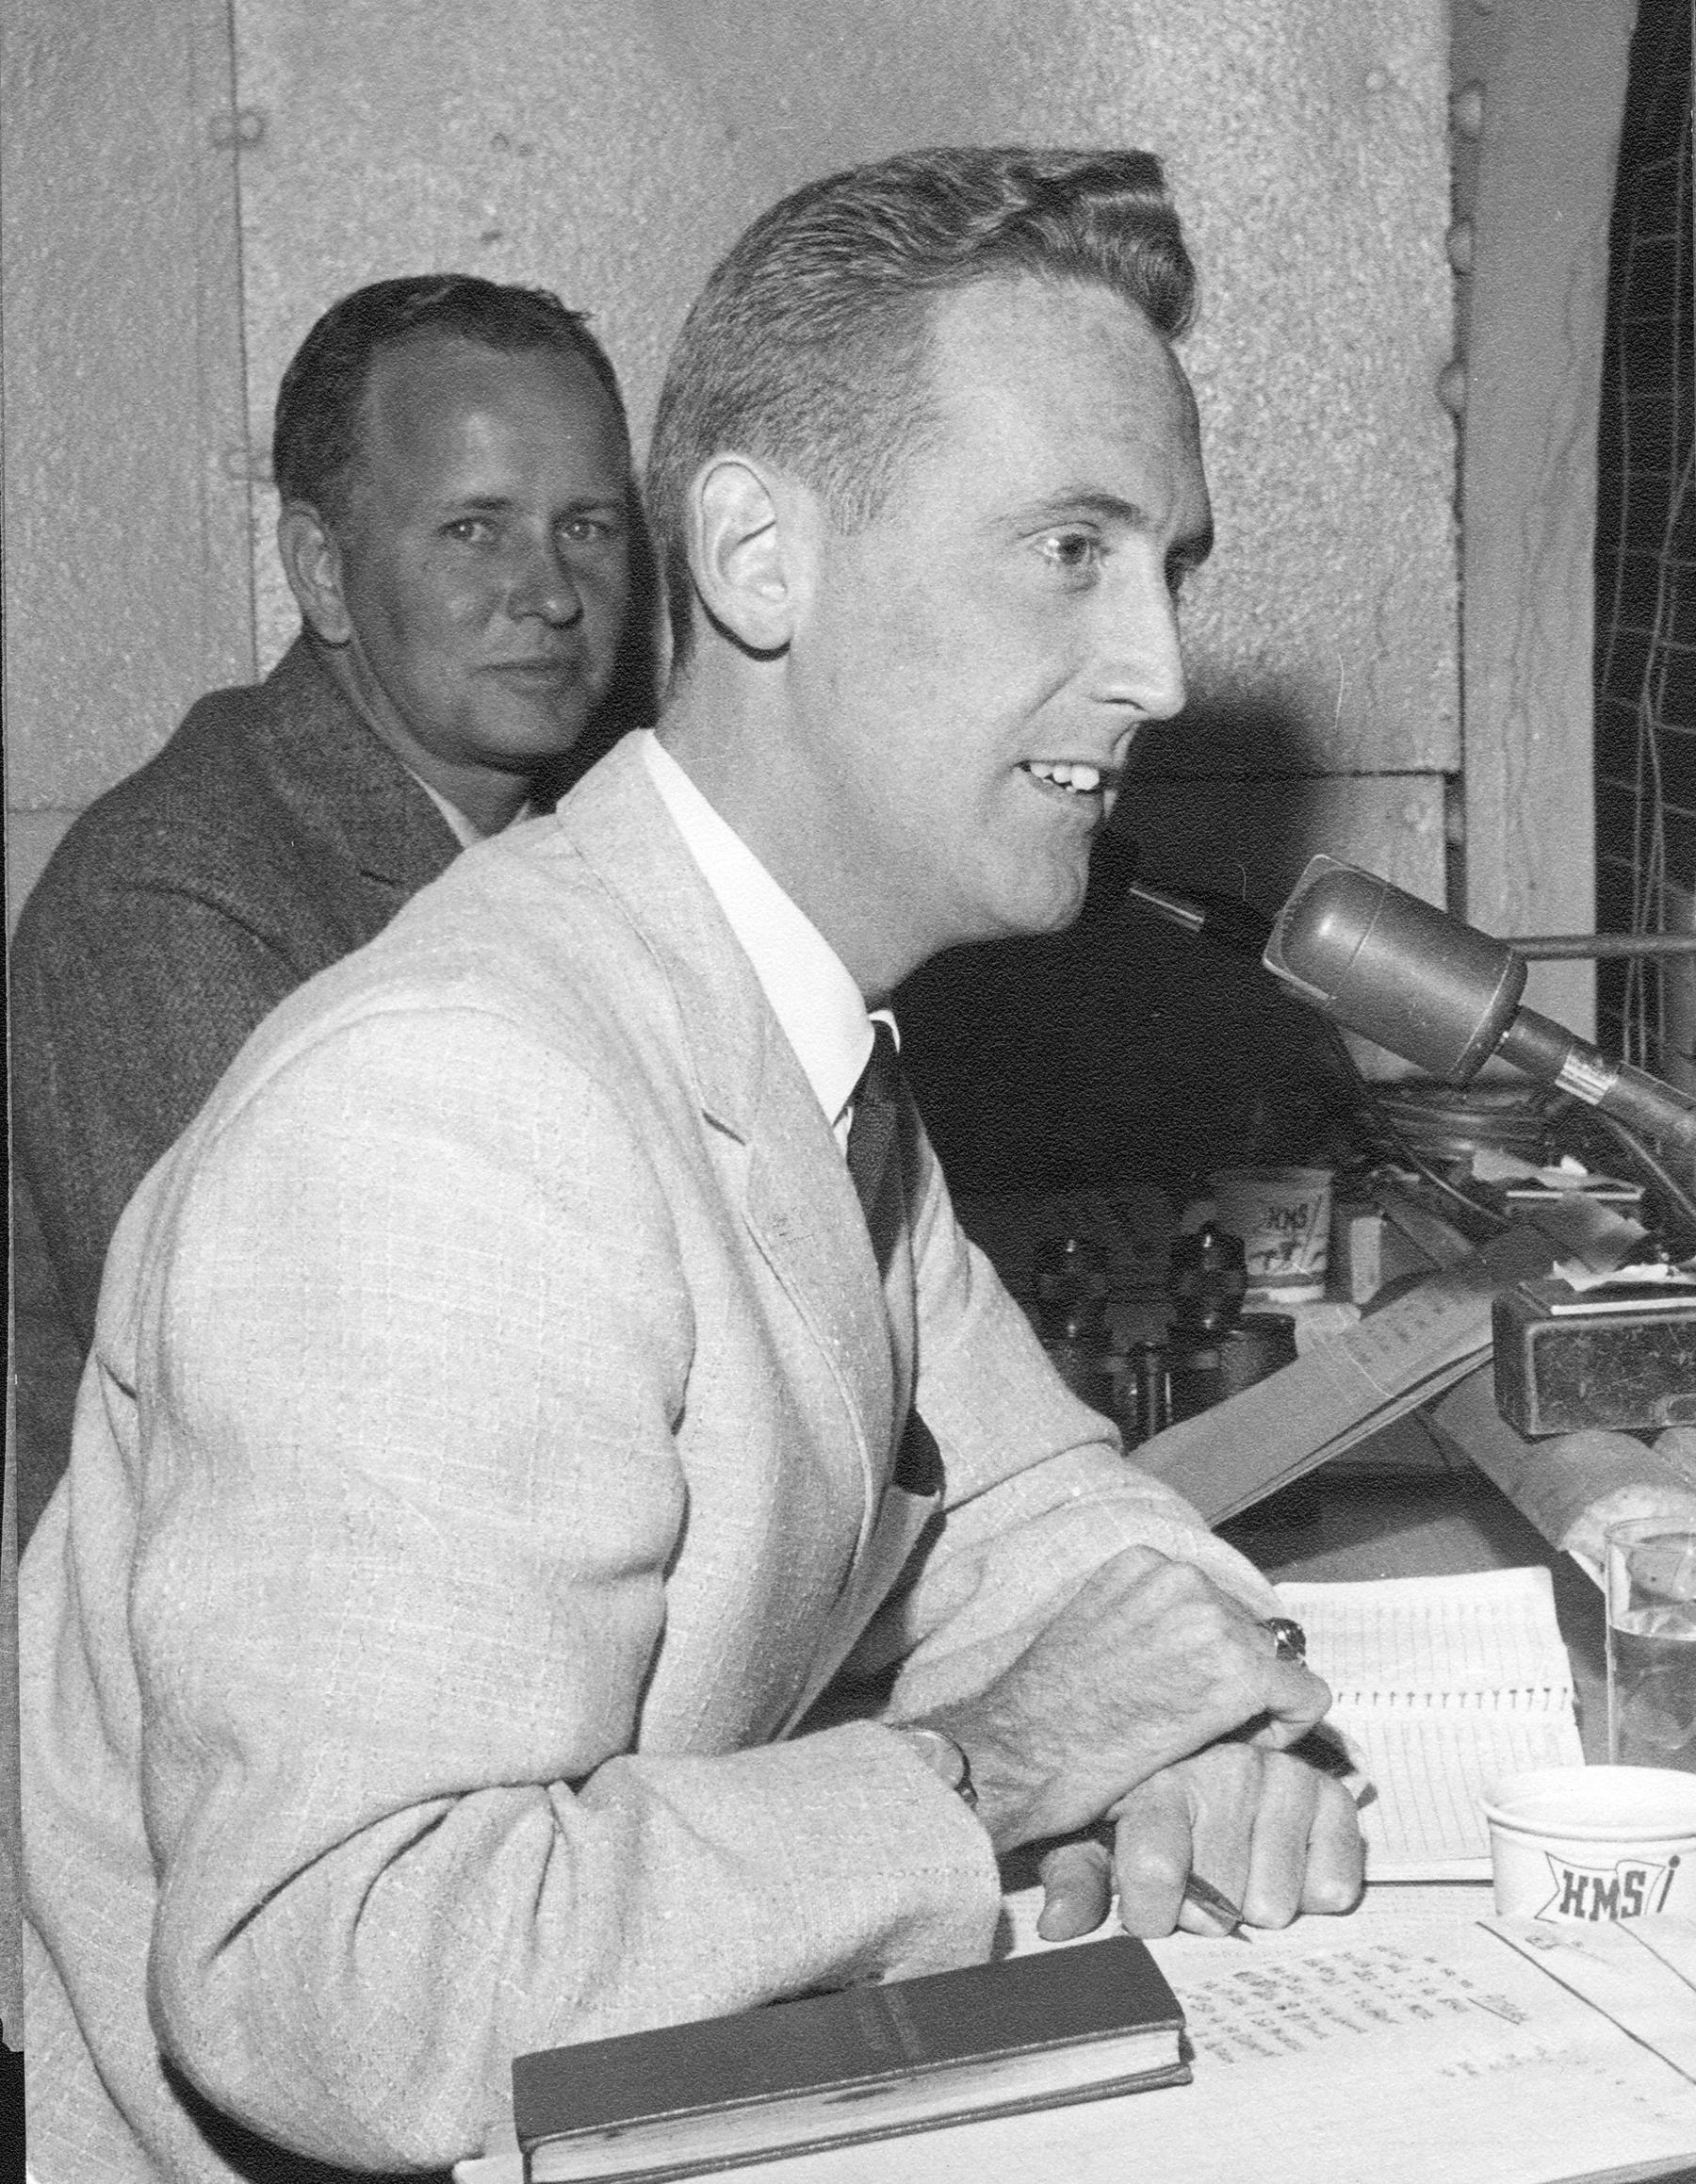 1982 Ford C. Frick Award Winner Vin Scully - BL-188-58 (National Baseball Hall of Fame Library)